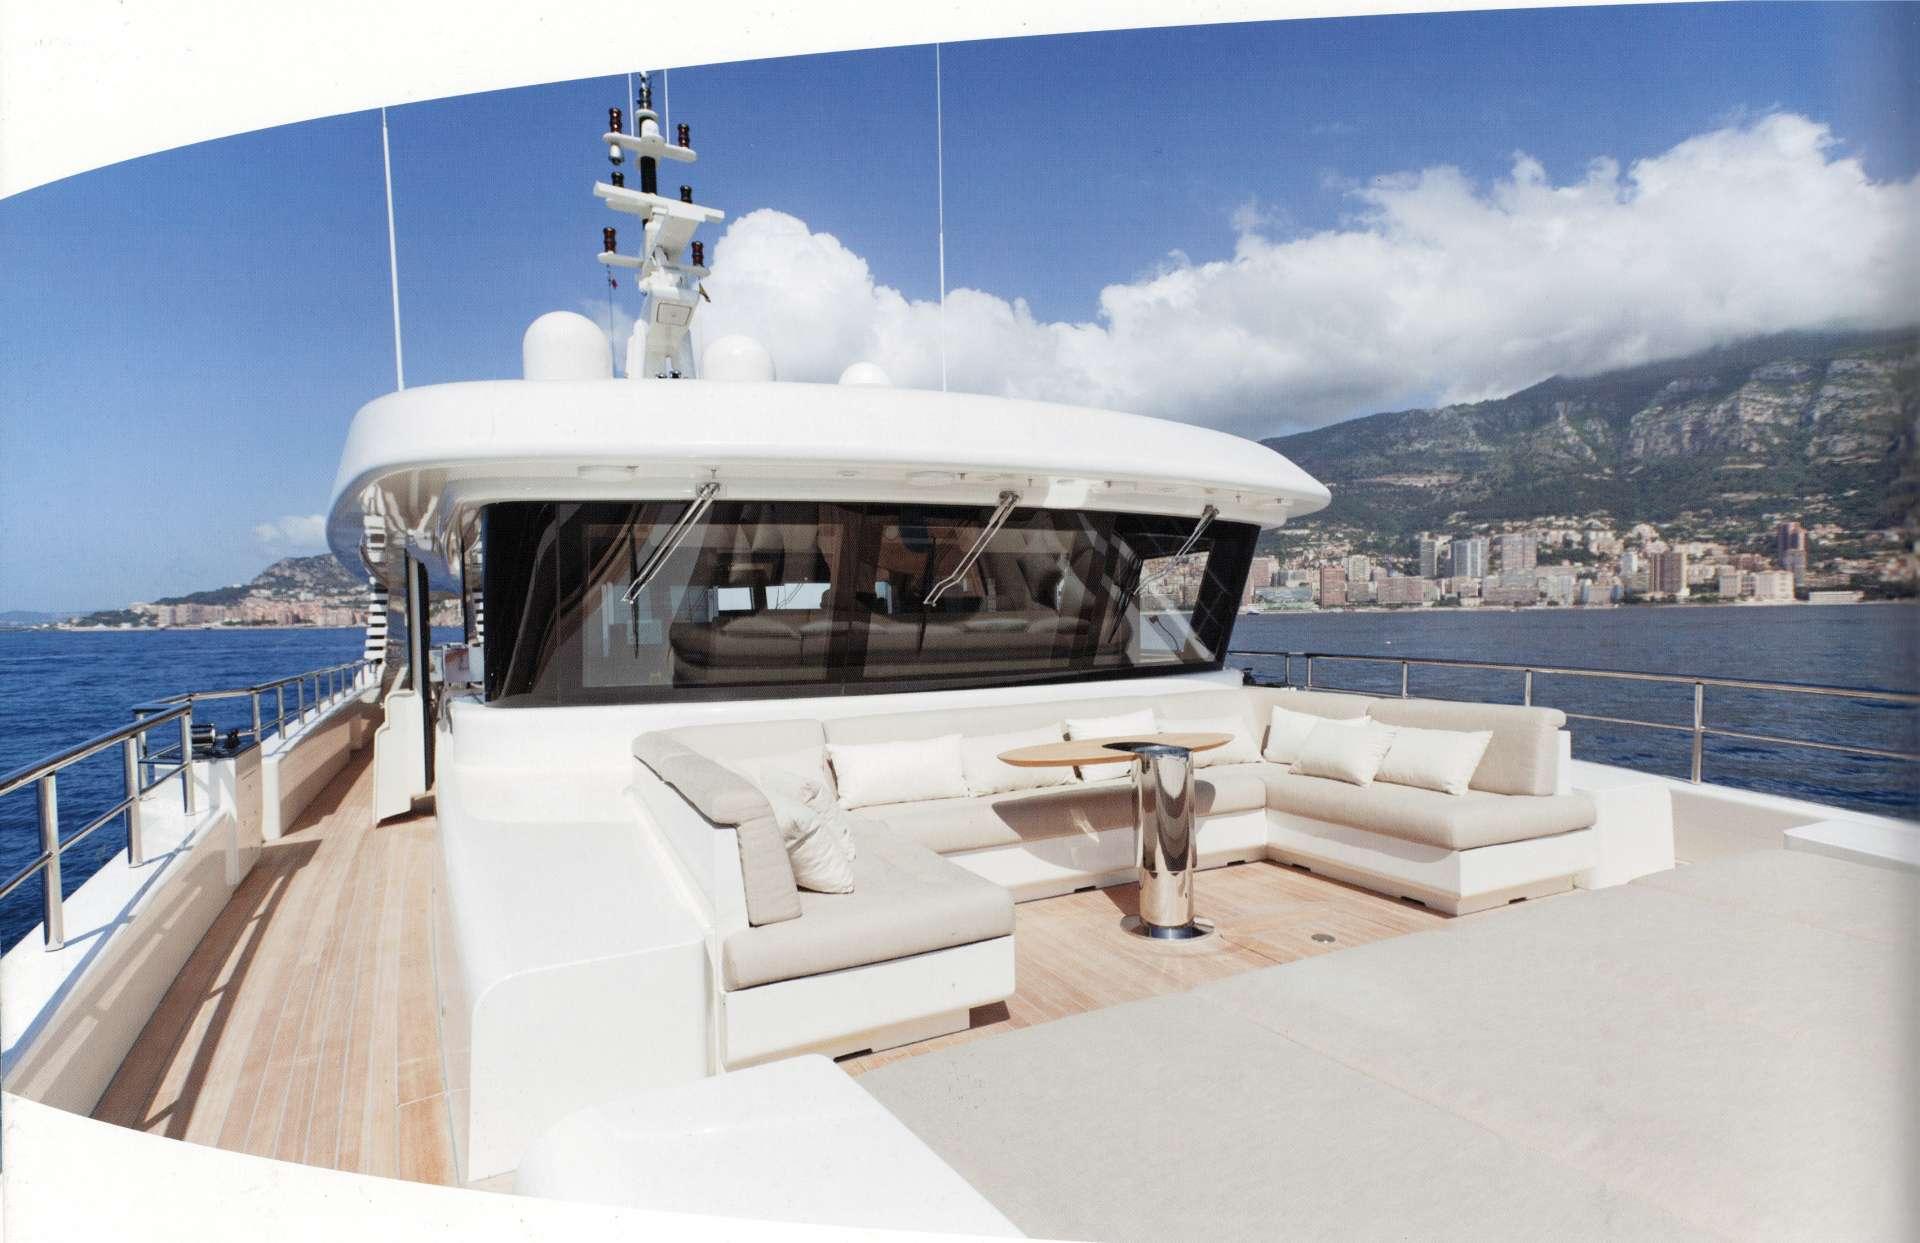 Power Yacht 'Power', 11 PAX,  Crew, 147.00 Ft, 45.00 Meters, Built 2012, ., Refit Year